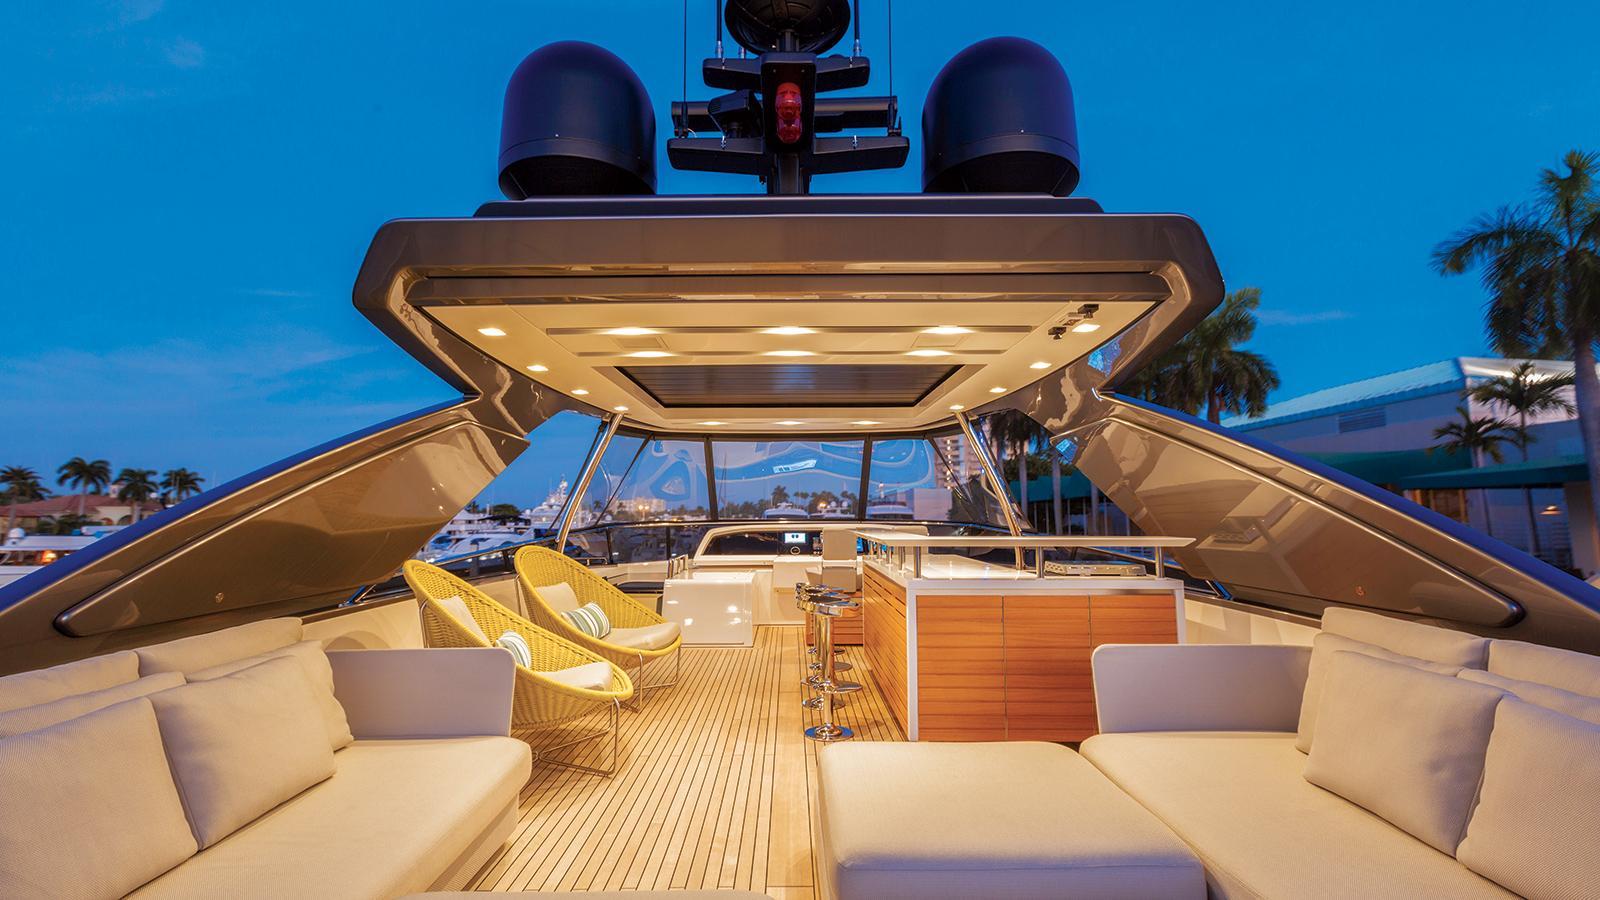 hull 651 motoryacht sanlorenzo sl86 27m 2016 sundeck credit jim raycroft